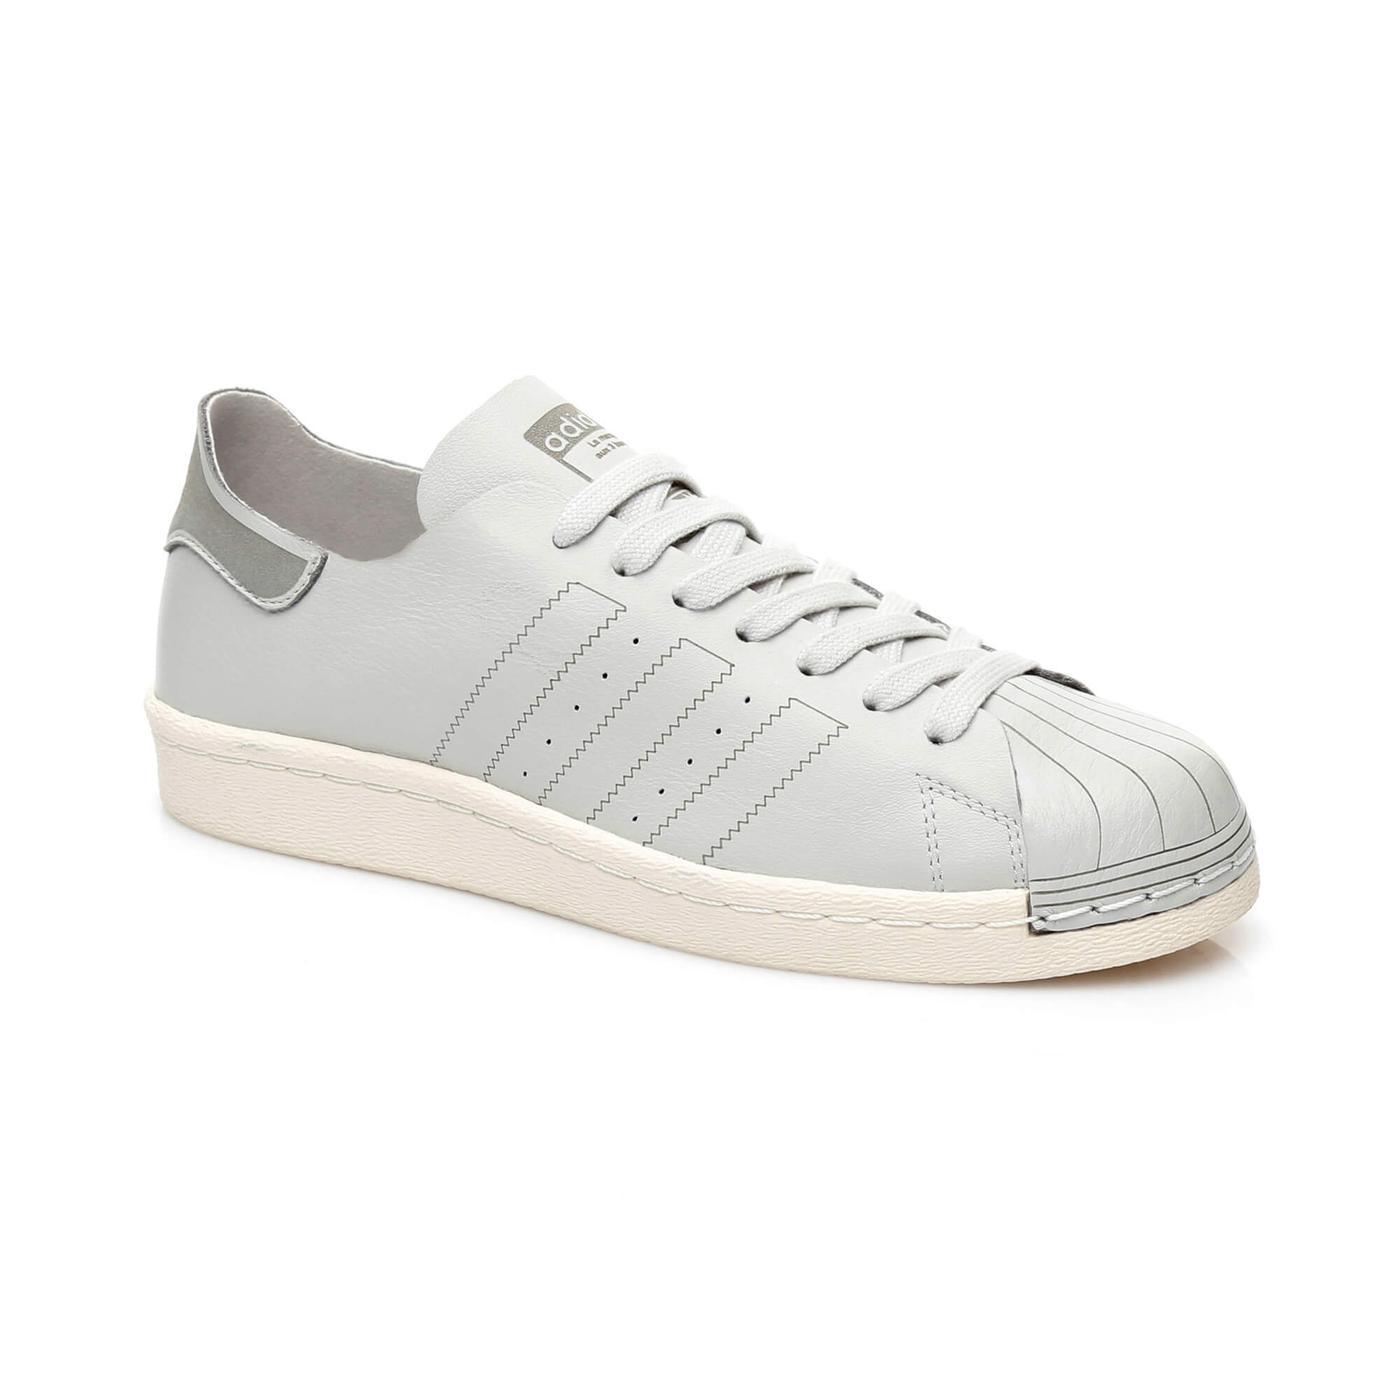 adidas Superstar 80'S Decon Kadın Gri Sneaker